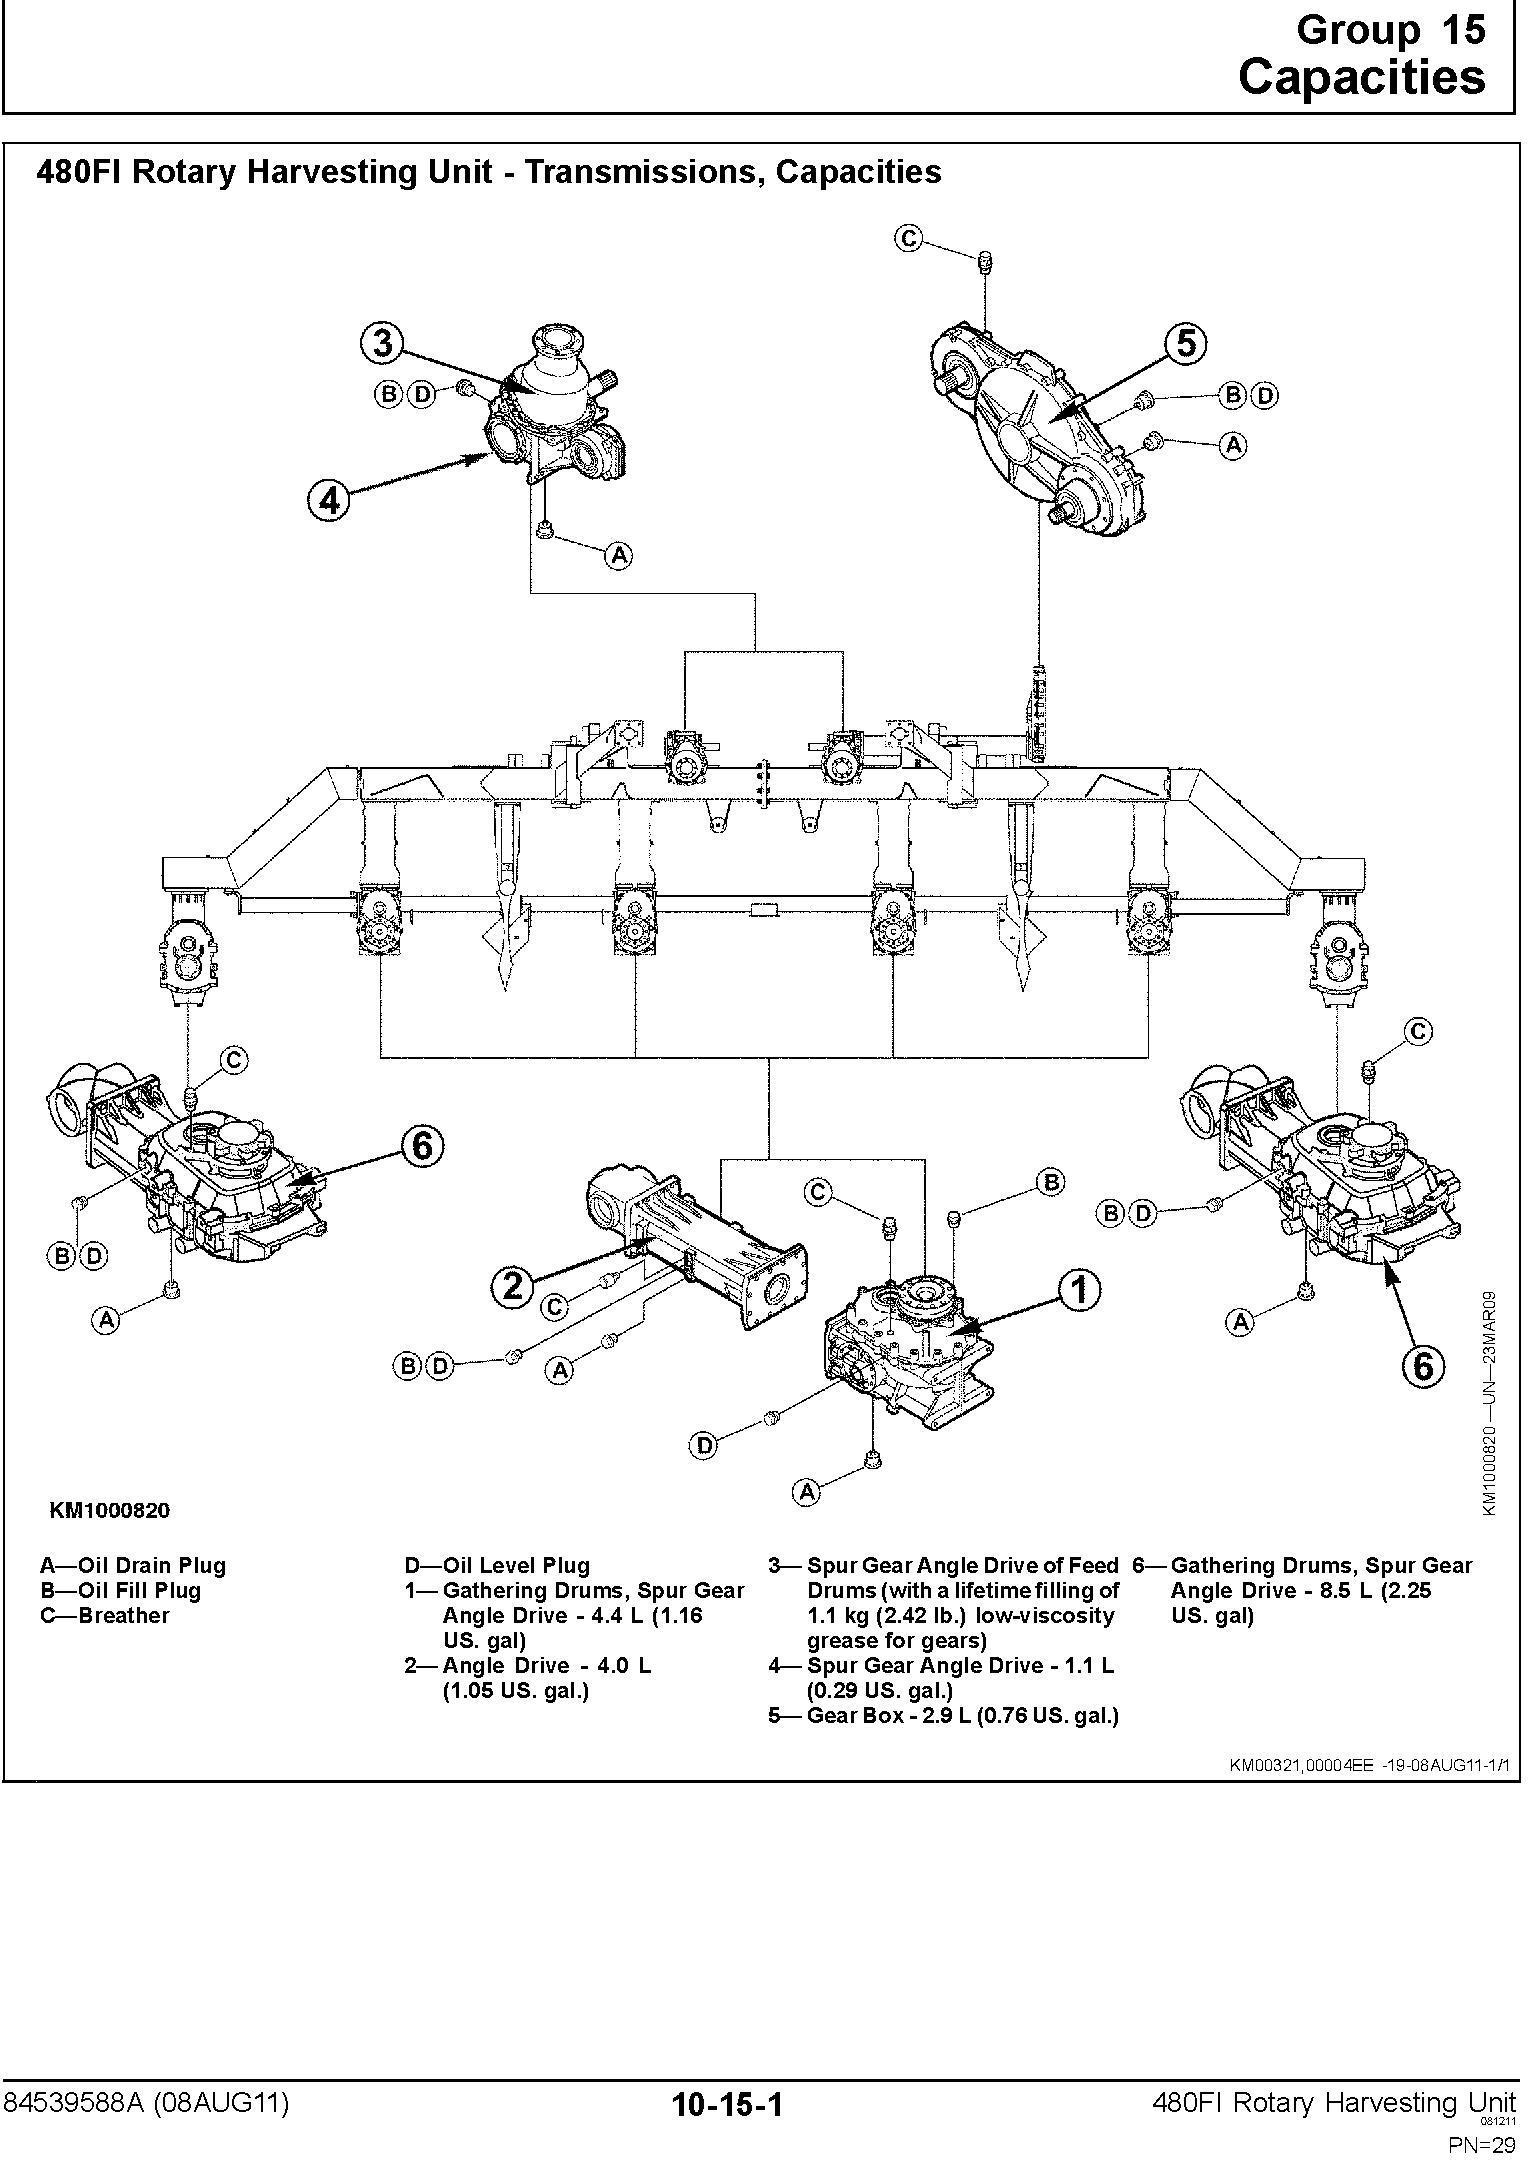 New Holland 480FI Row Independent Corn Head Service Manual - 2